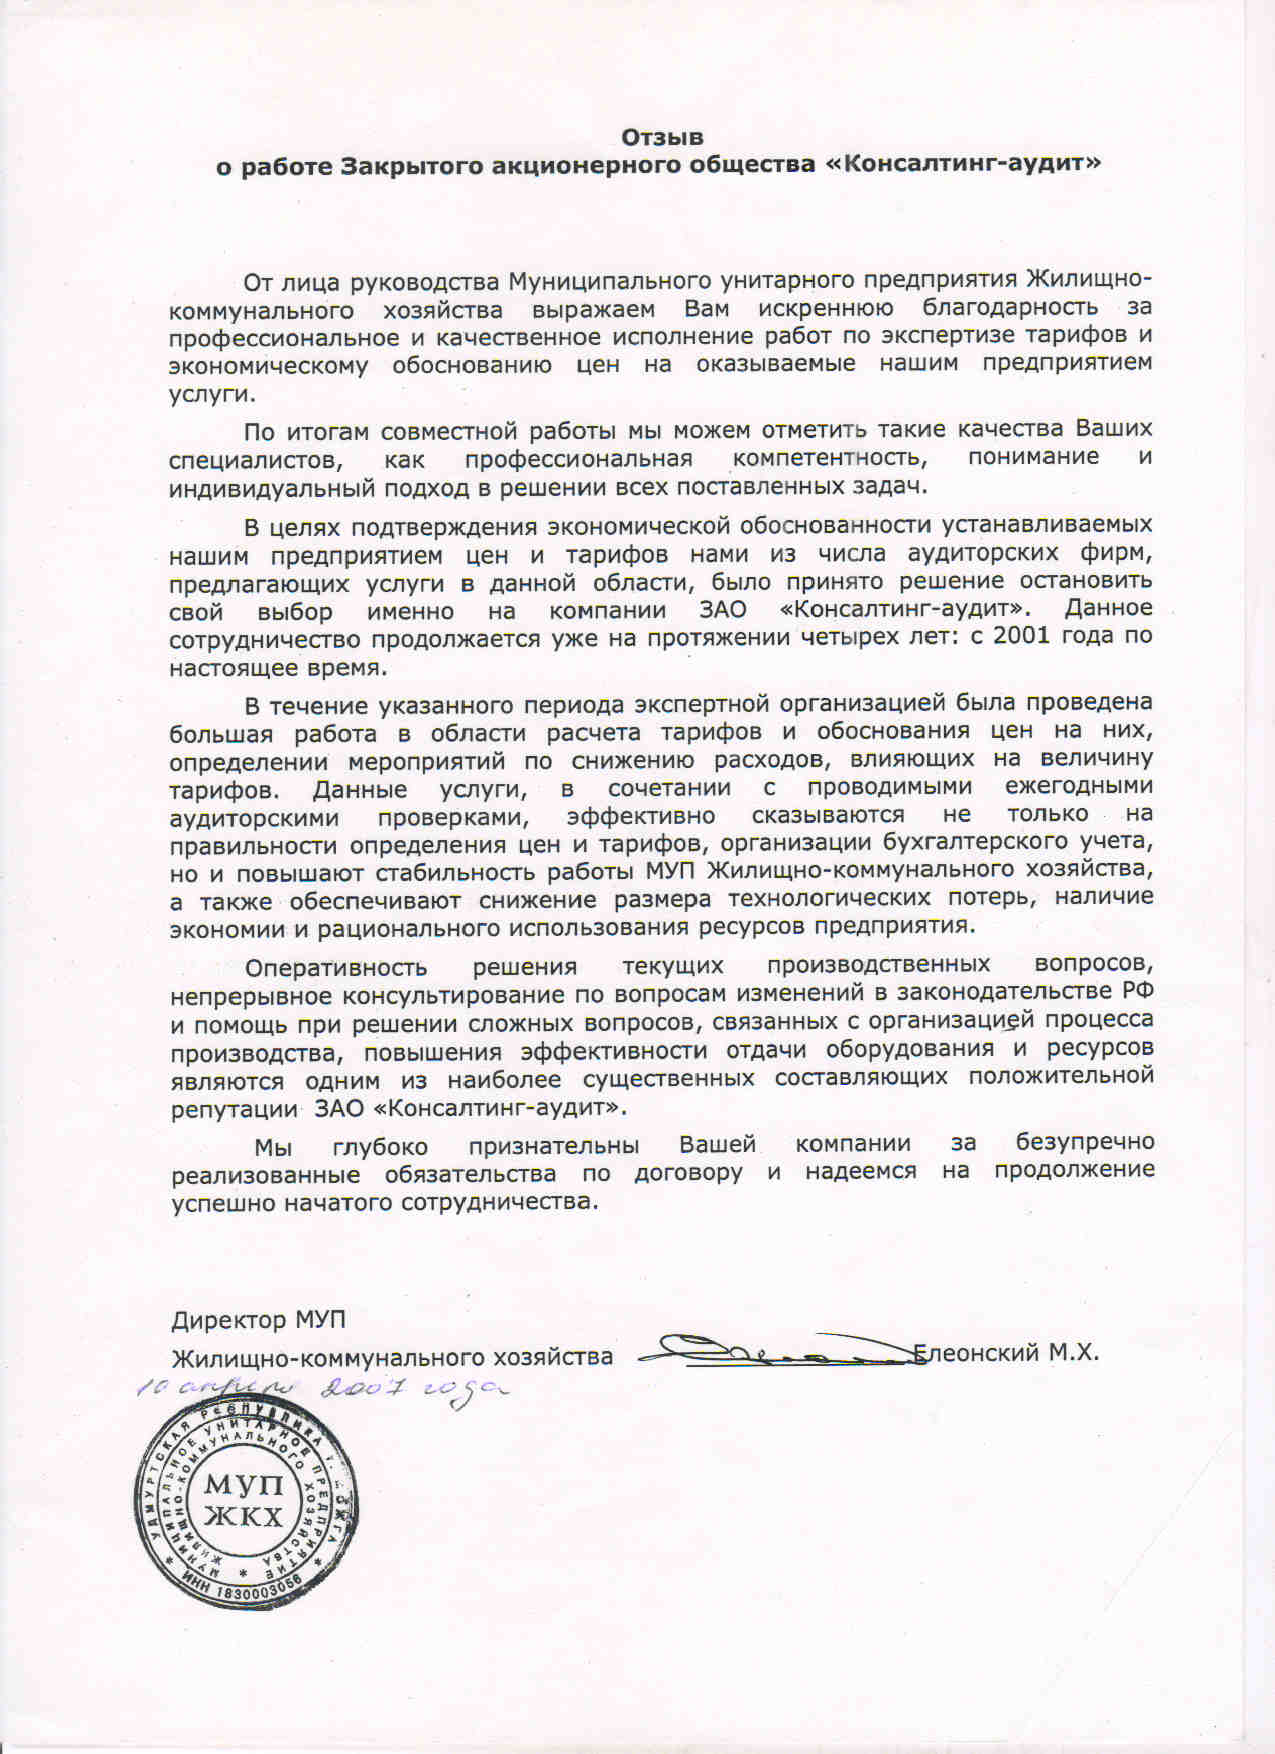 Отзыв МУП ЖКХ г.Можга_апр 2007